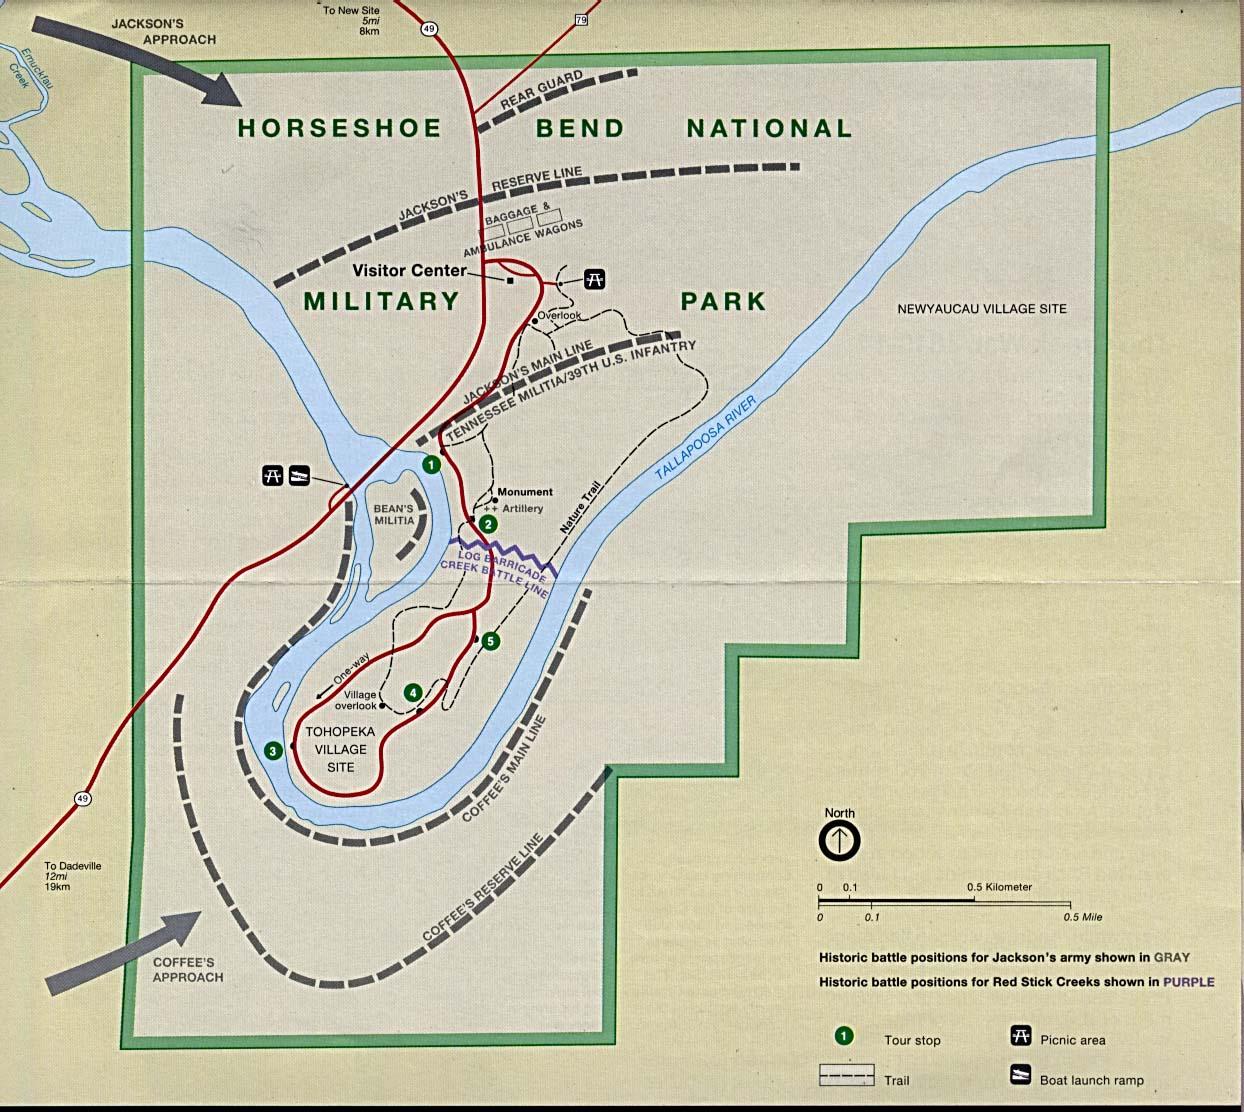 Maps of United States National Parks, Monuments and Historic Sites Horseshoe Bend National Military Park [Alabama] (Park Map) (230K)